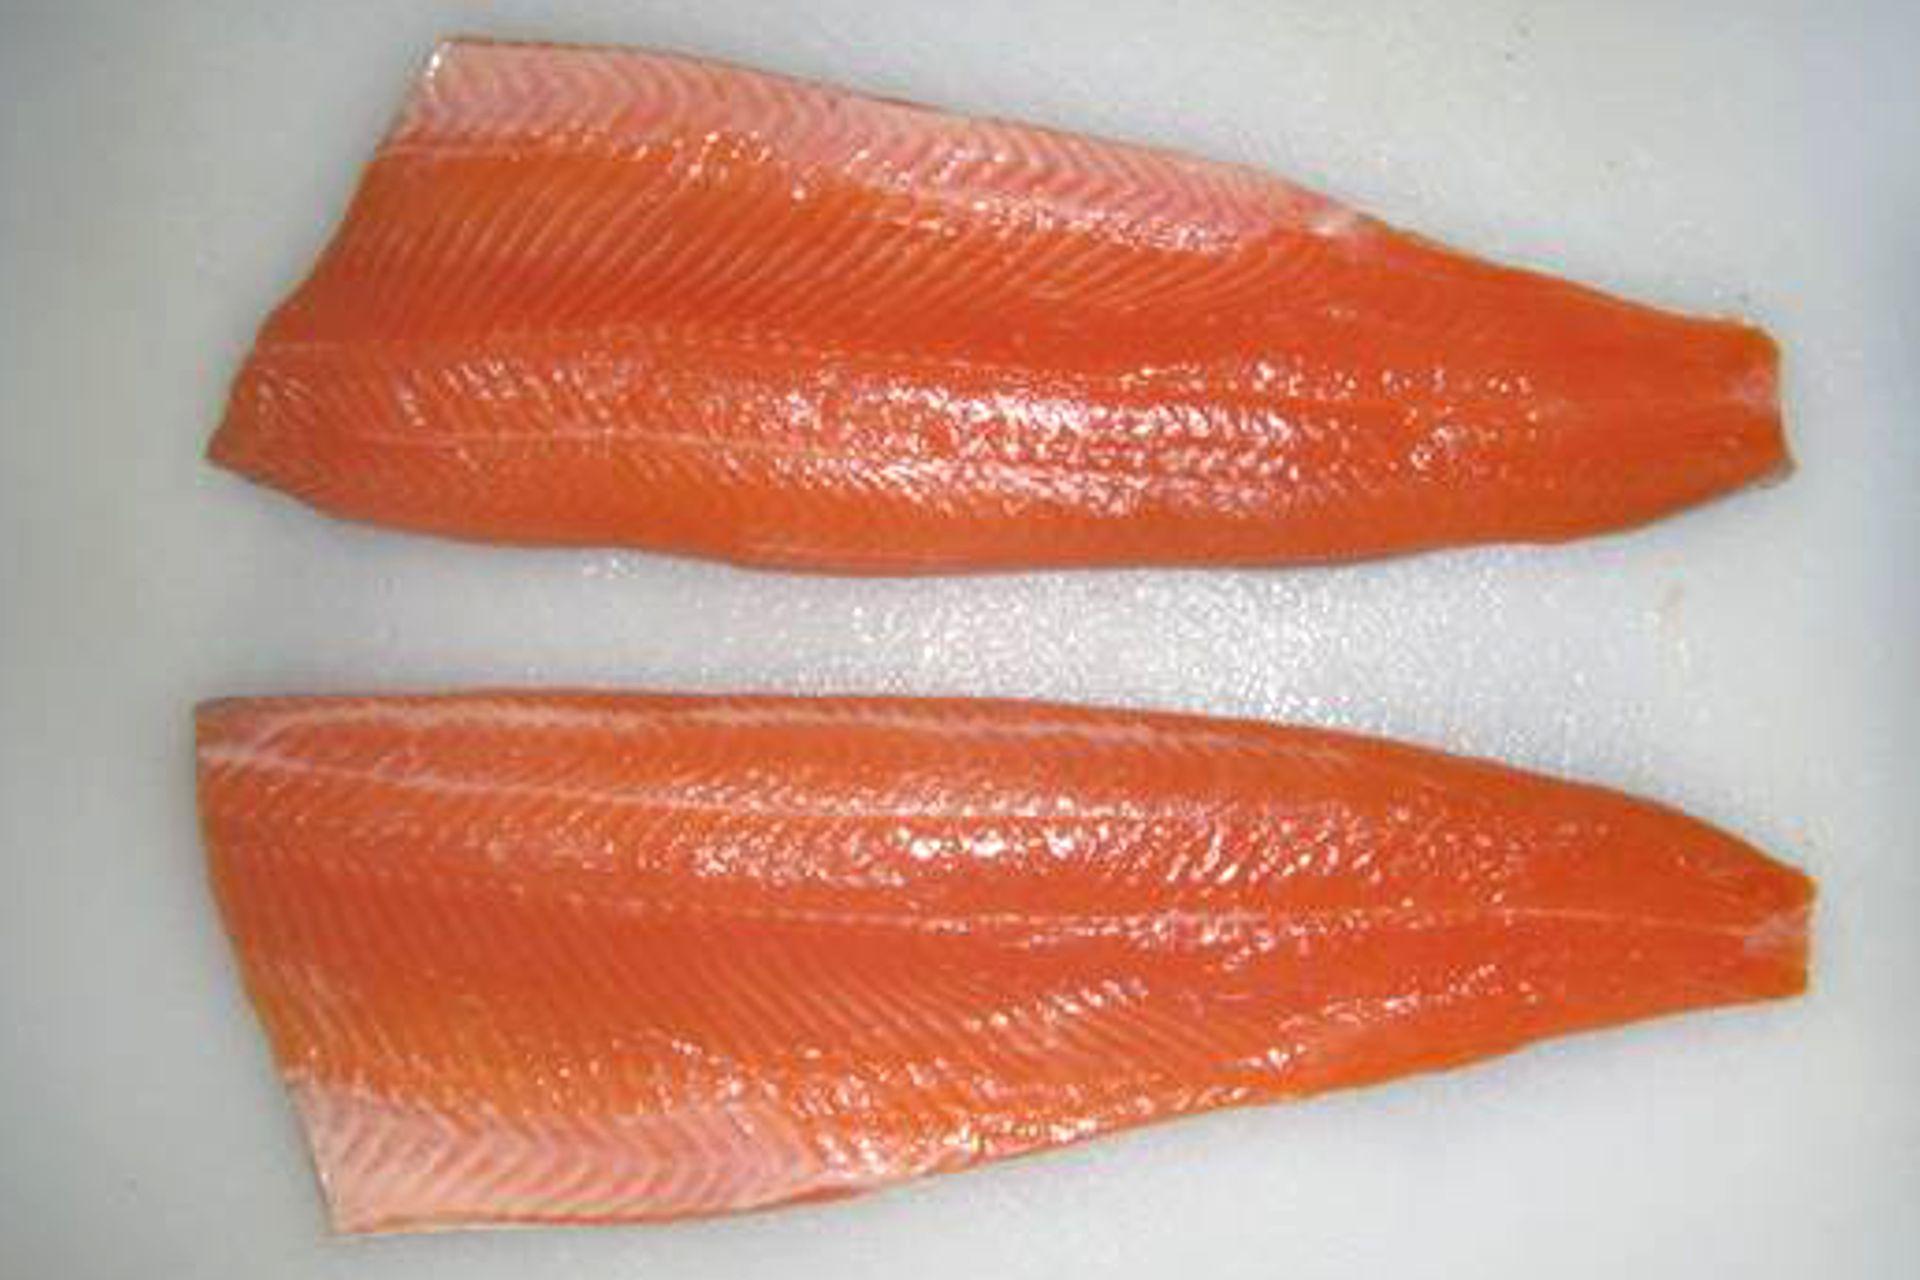 STEELHEAD TROUT / SALMON TROUT - PYRENAQUA FISH & SEAFOOD